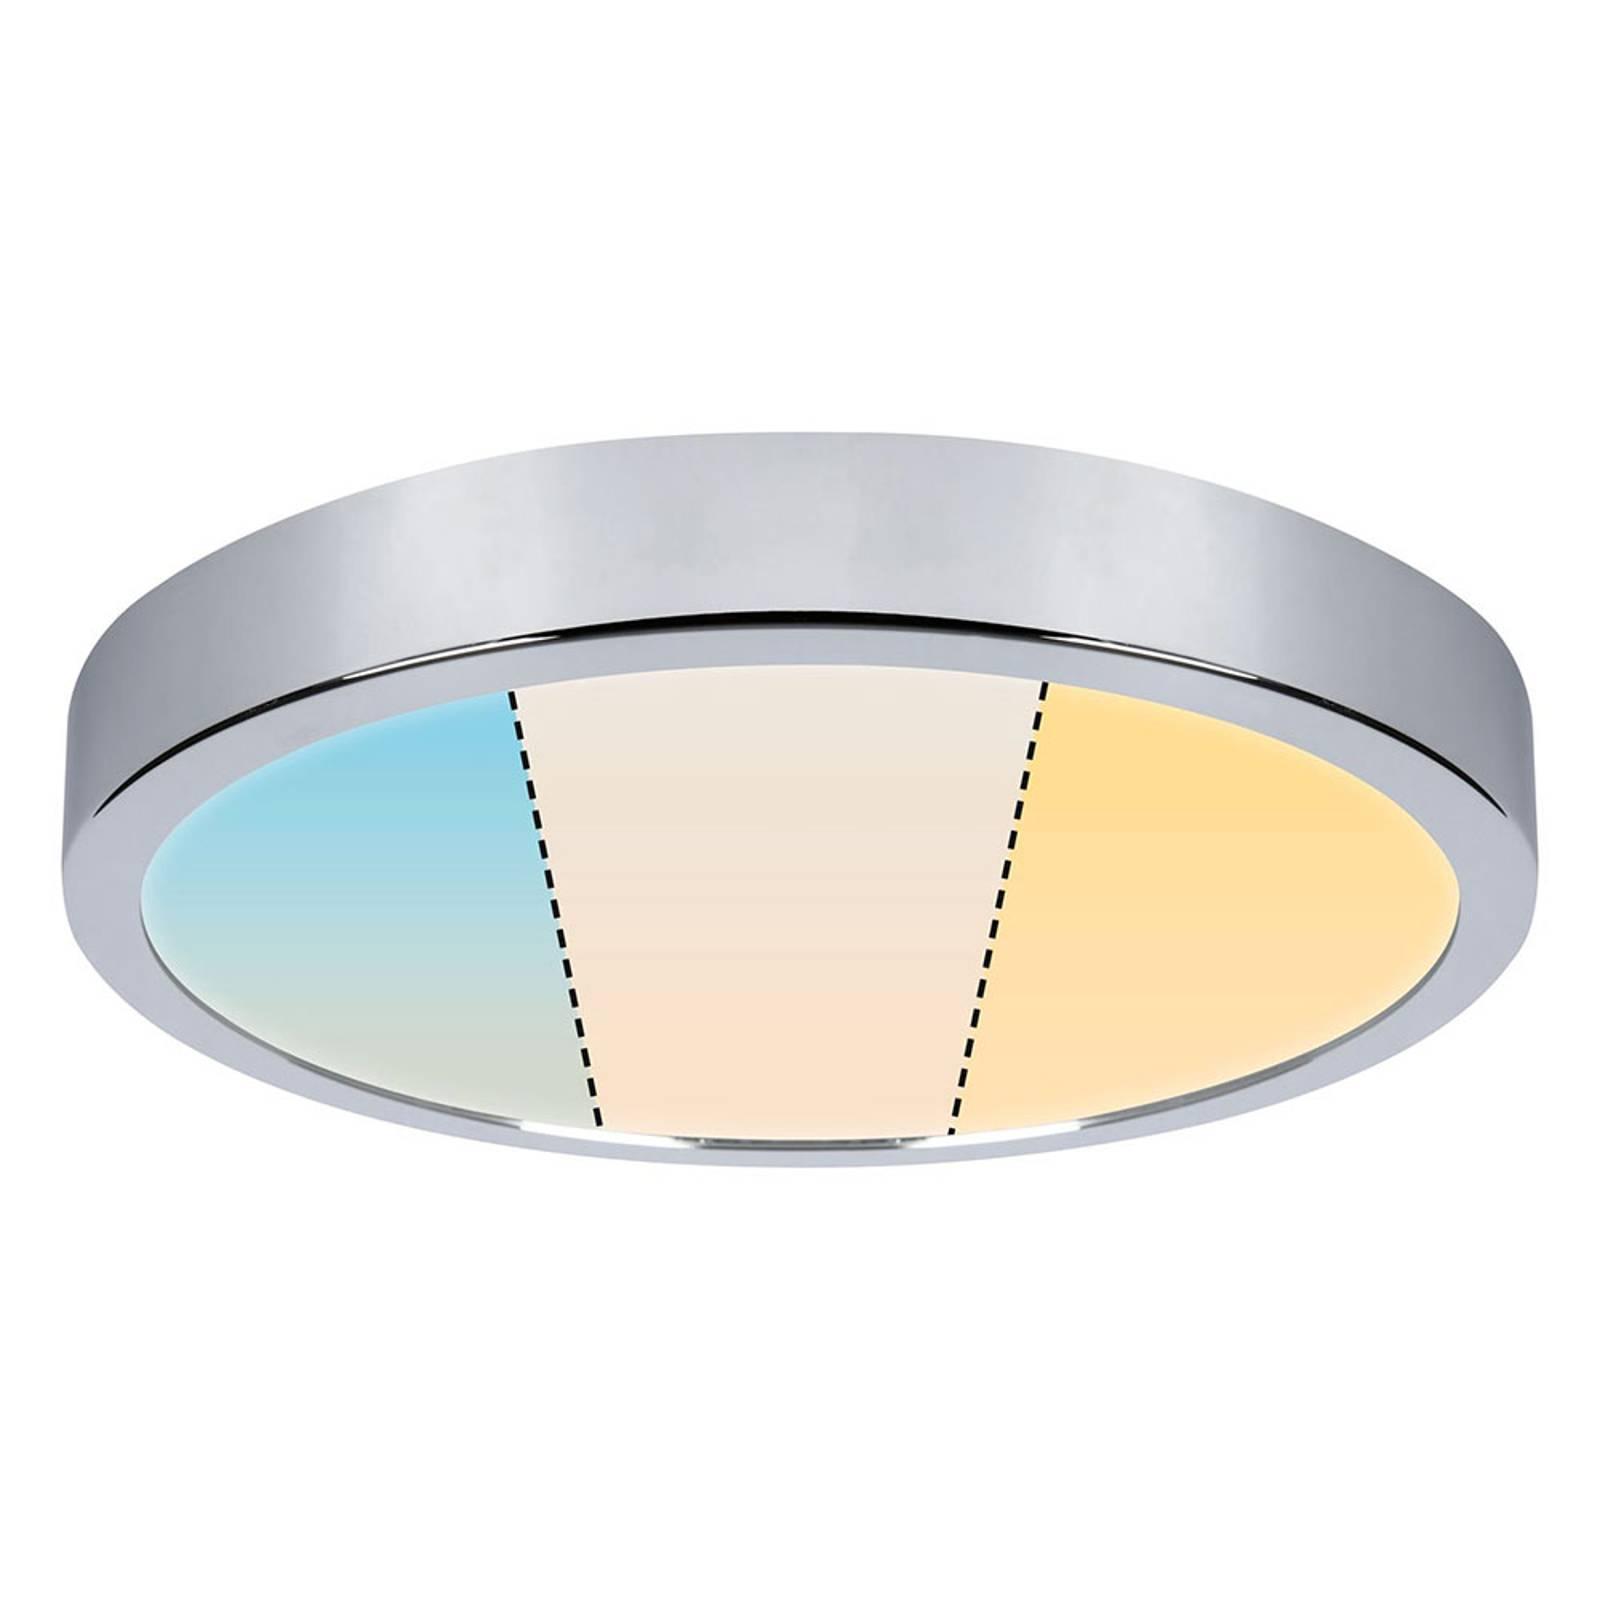 Paulmann Aviar LED plafondlamp WhiteSwitch Ø 30cm